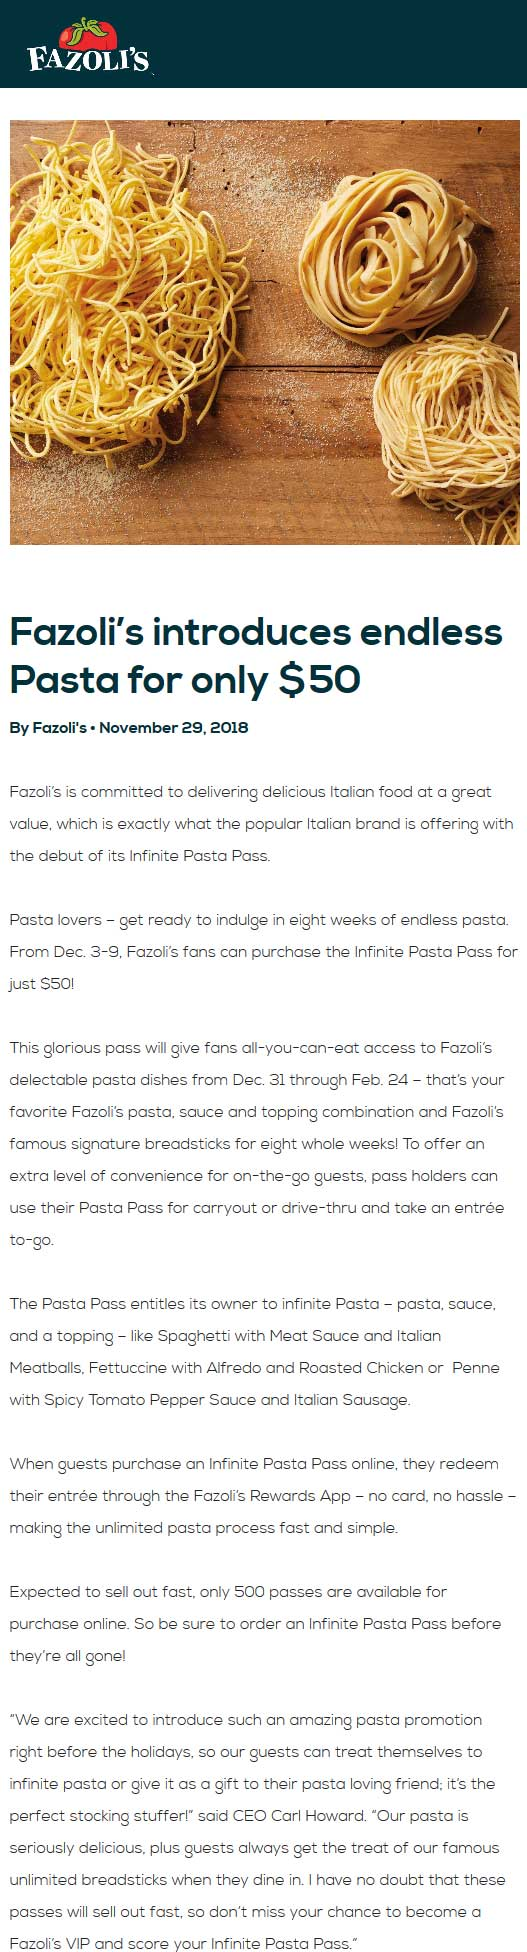 Fazolis Coupon February 2020 Infinite pasta pass for 8wks = $50 at Fazolis restaurants